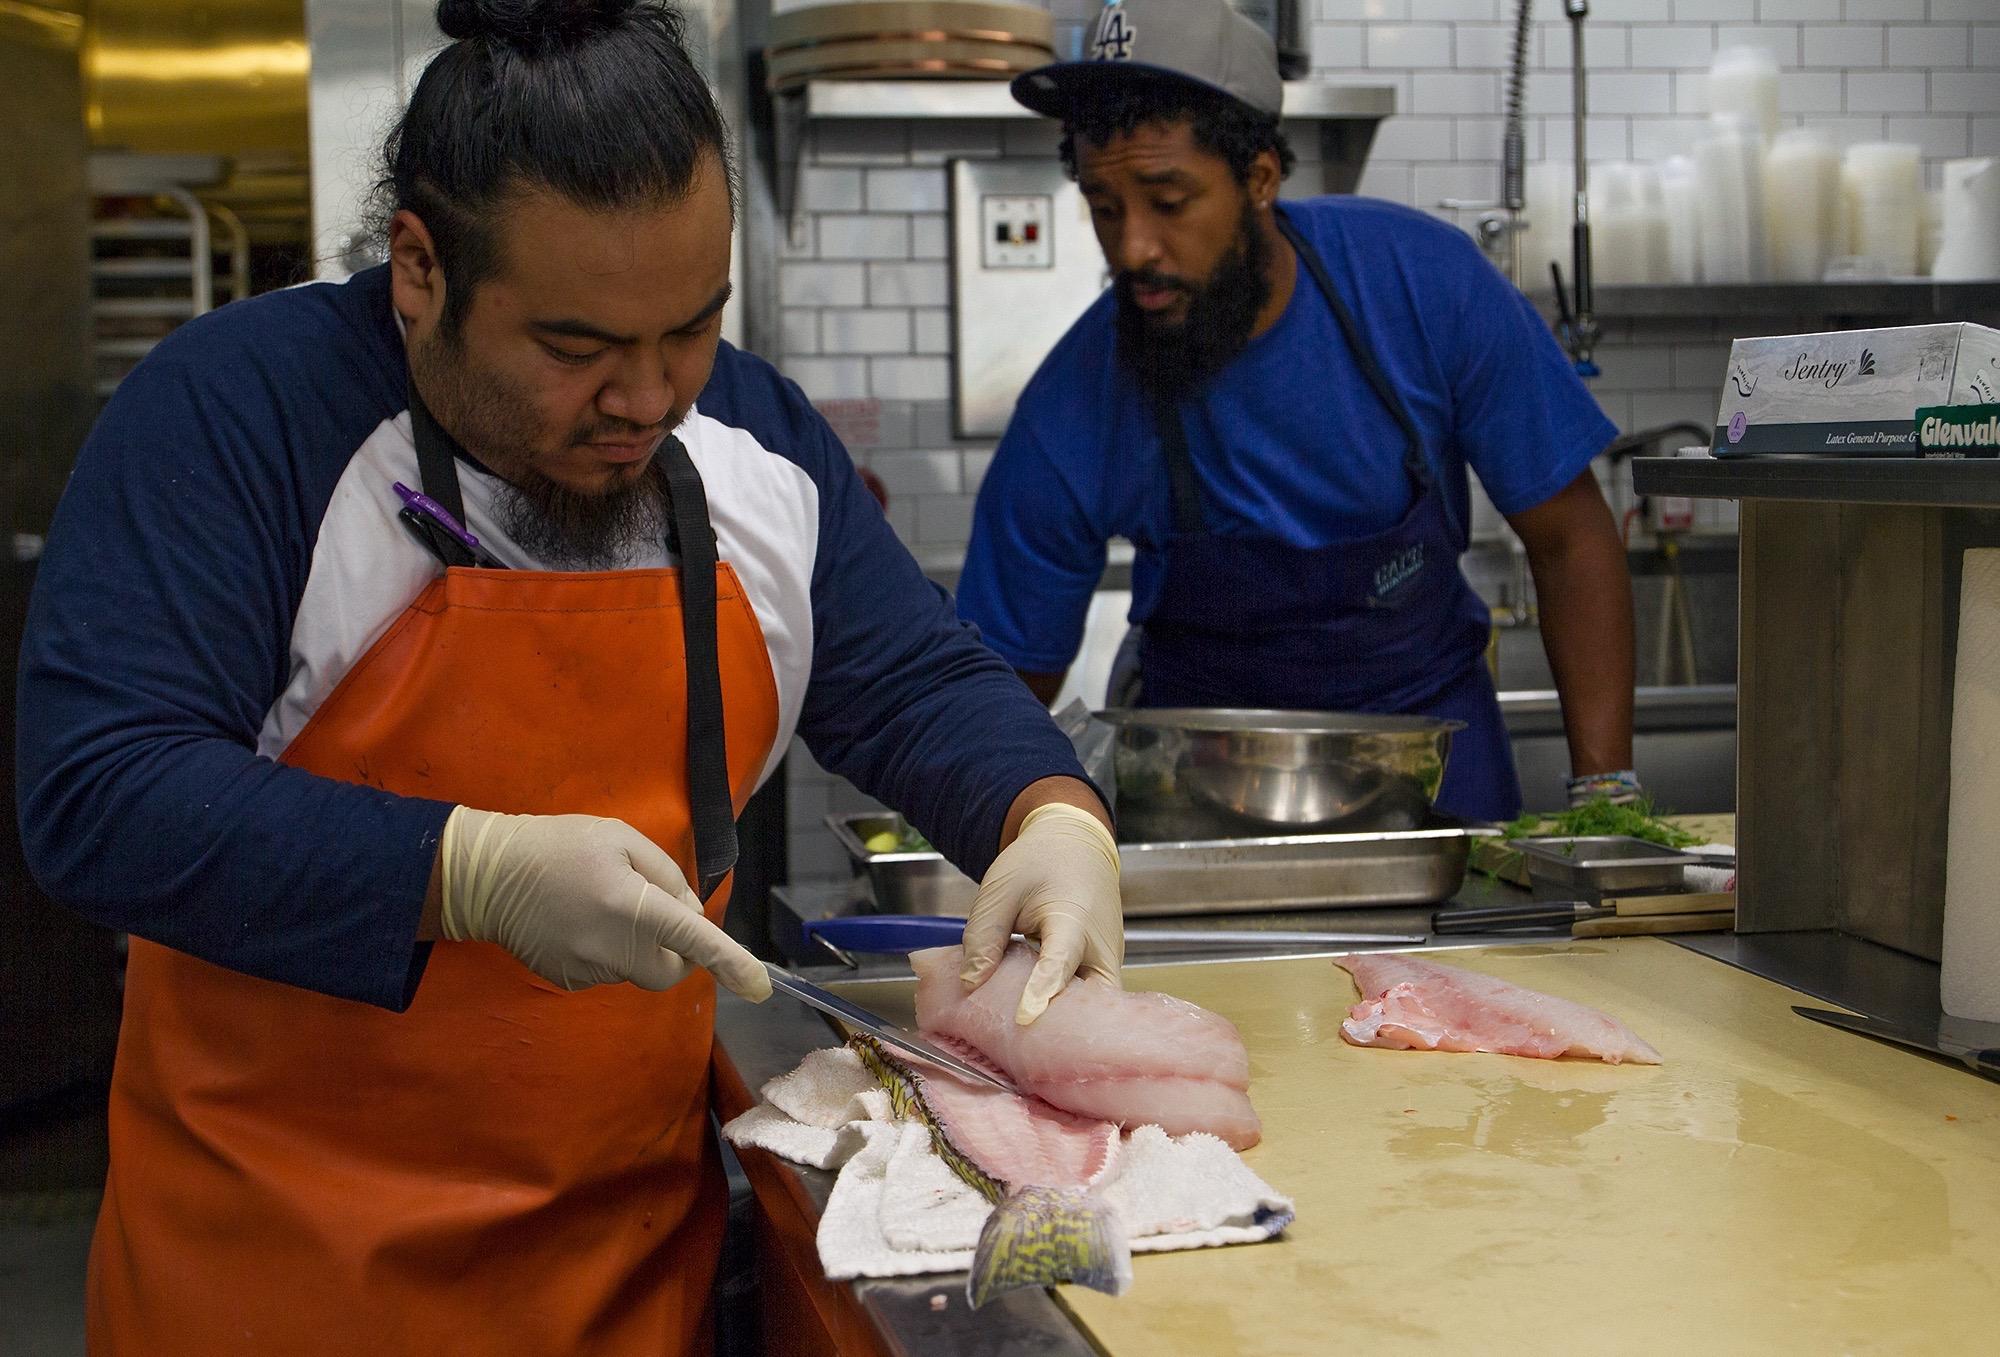 2000-cape-seafood-ehder-dominguez-brandon-gray